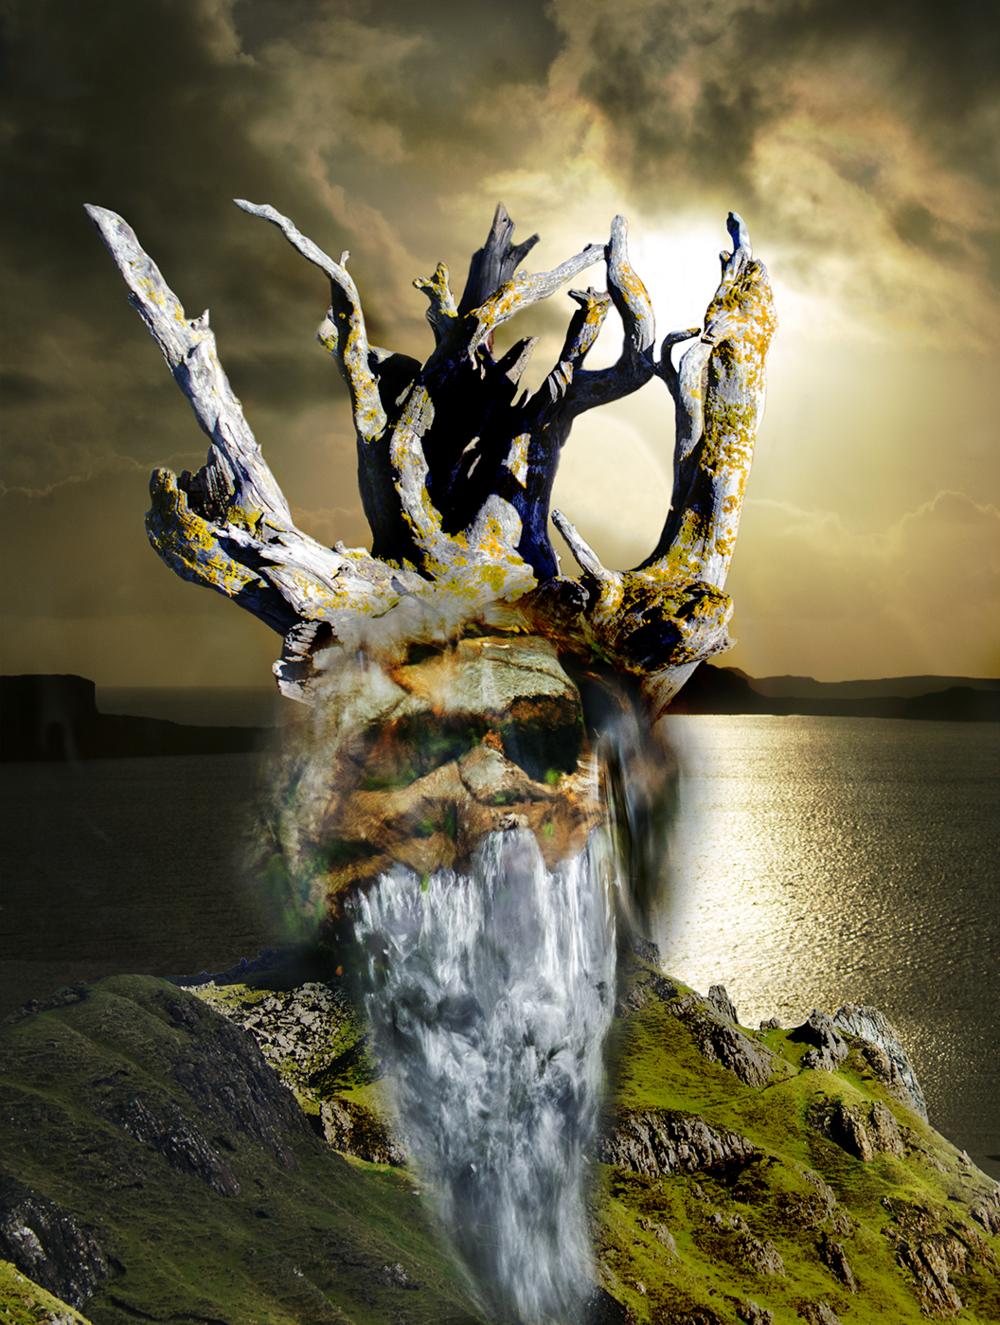 Scotland King_for web_color balance.png